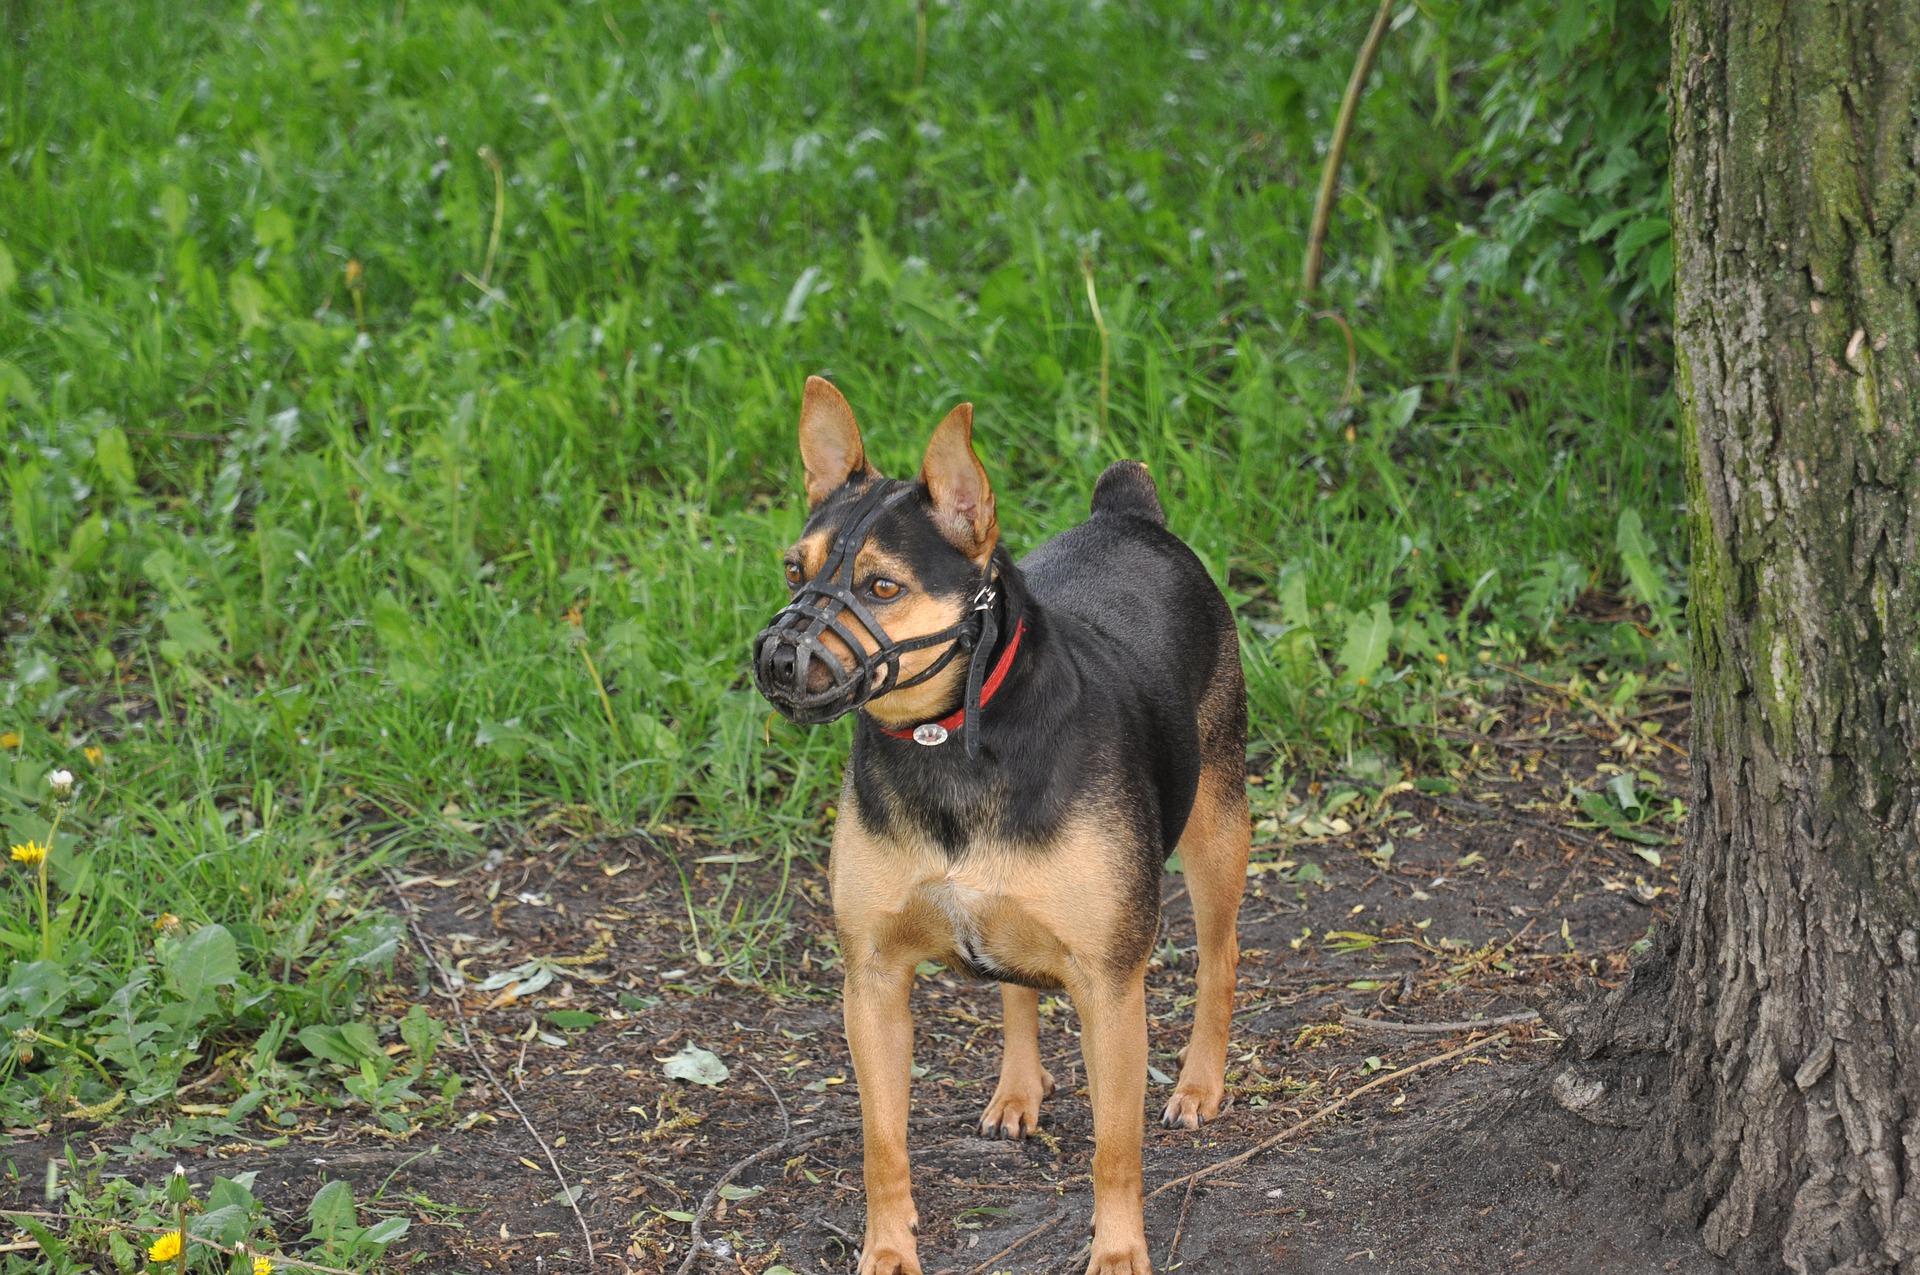 Der Maulkorb beim Hund